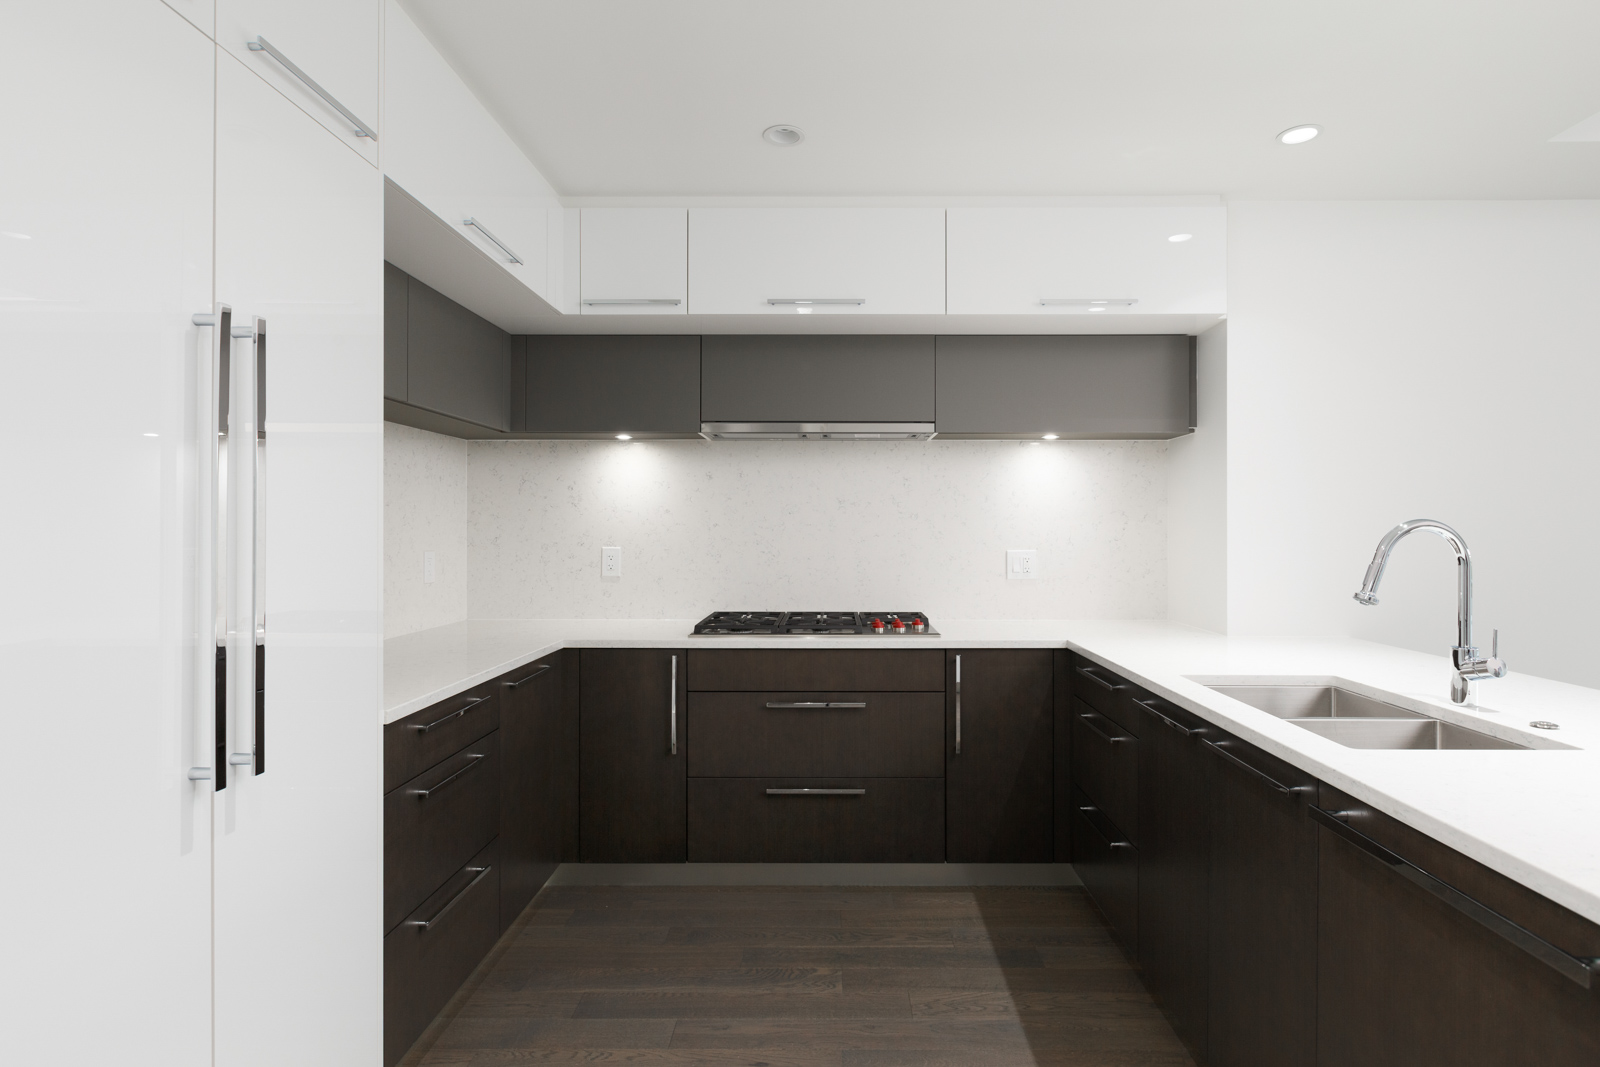 Kitchen in rental property in The Kirkland building in Kerrisdale Vancouver